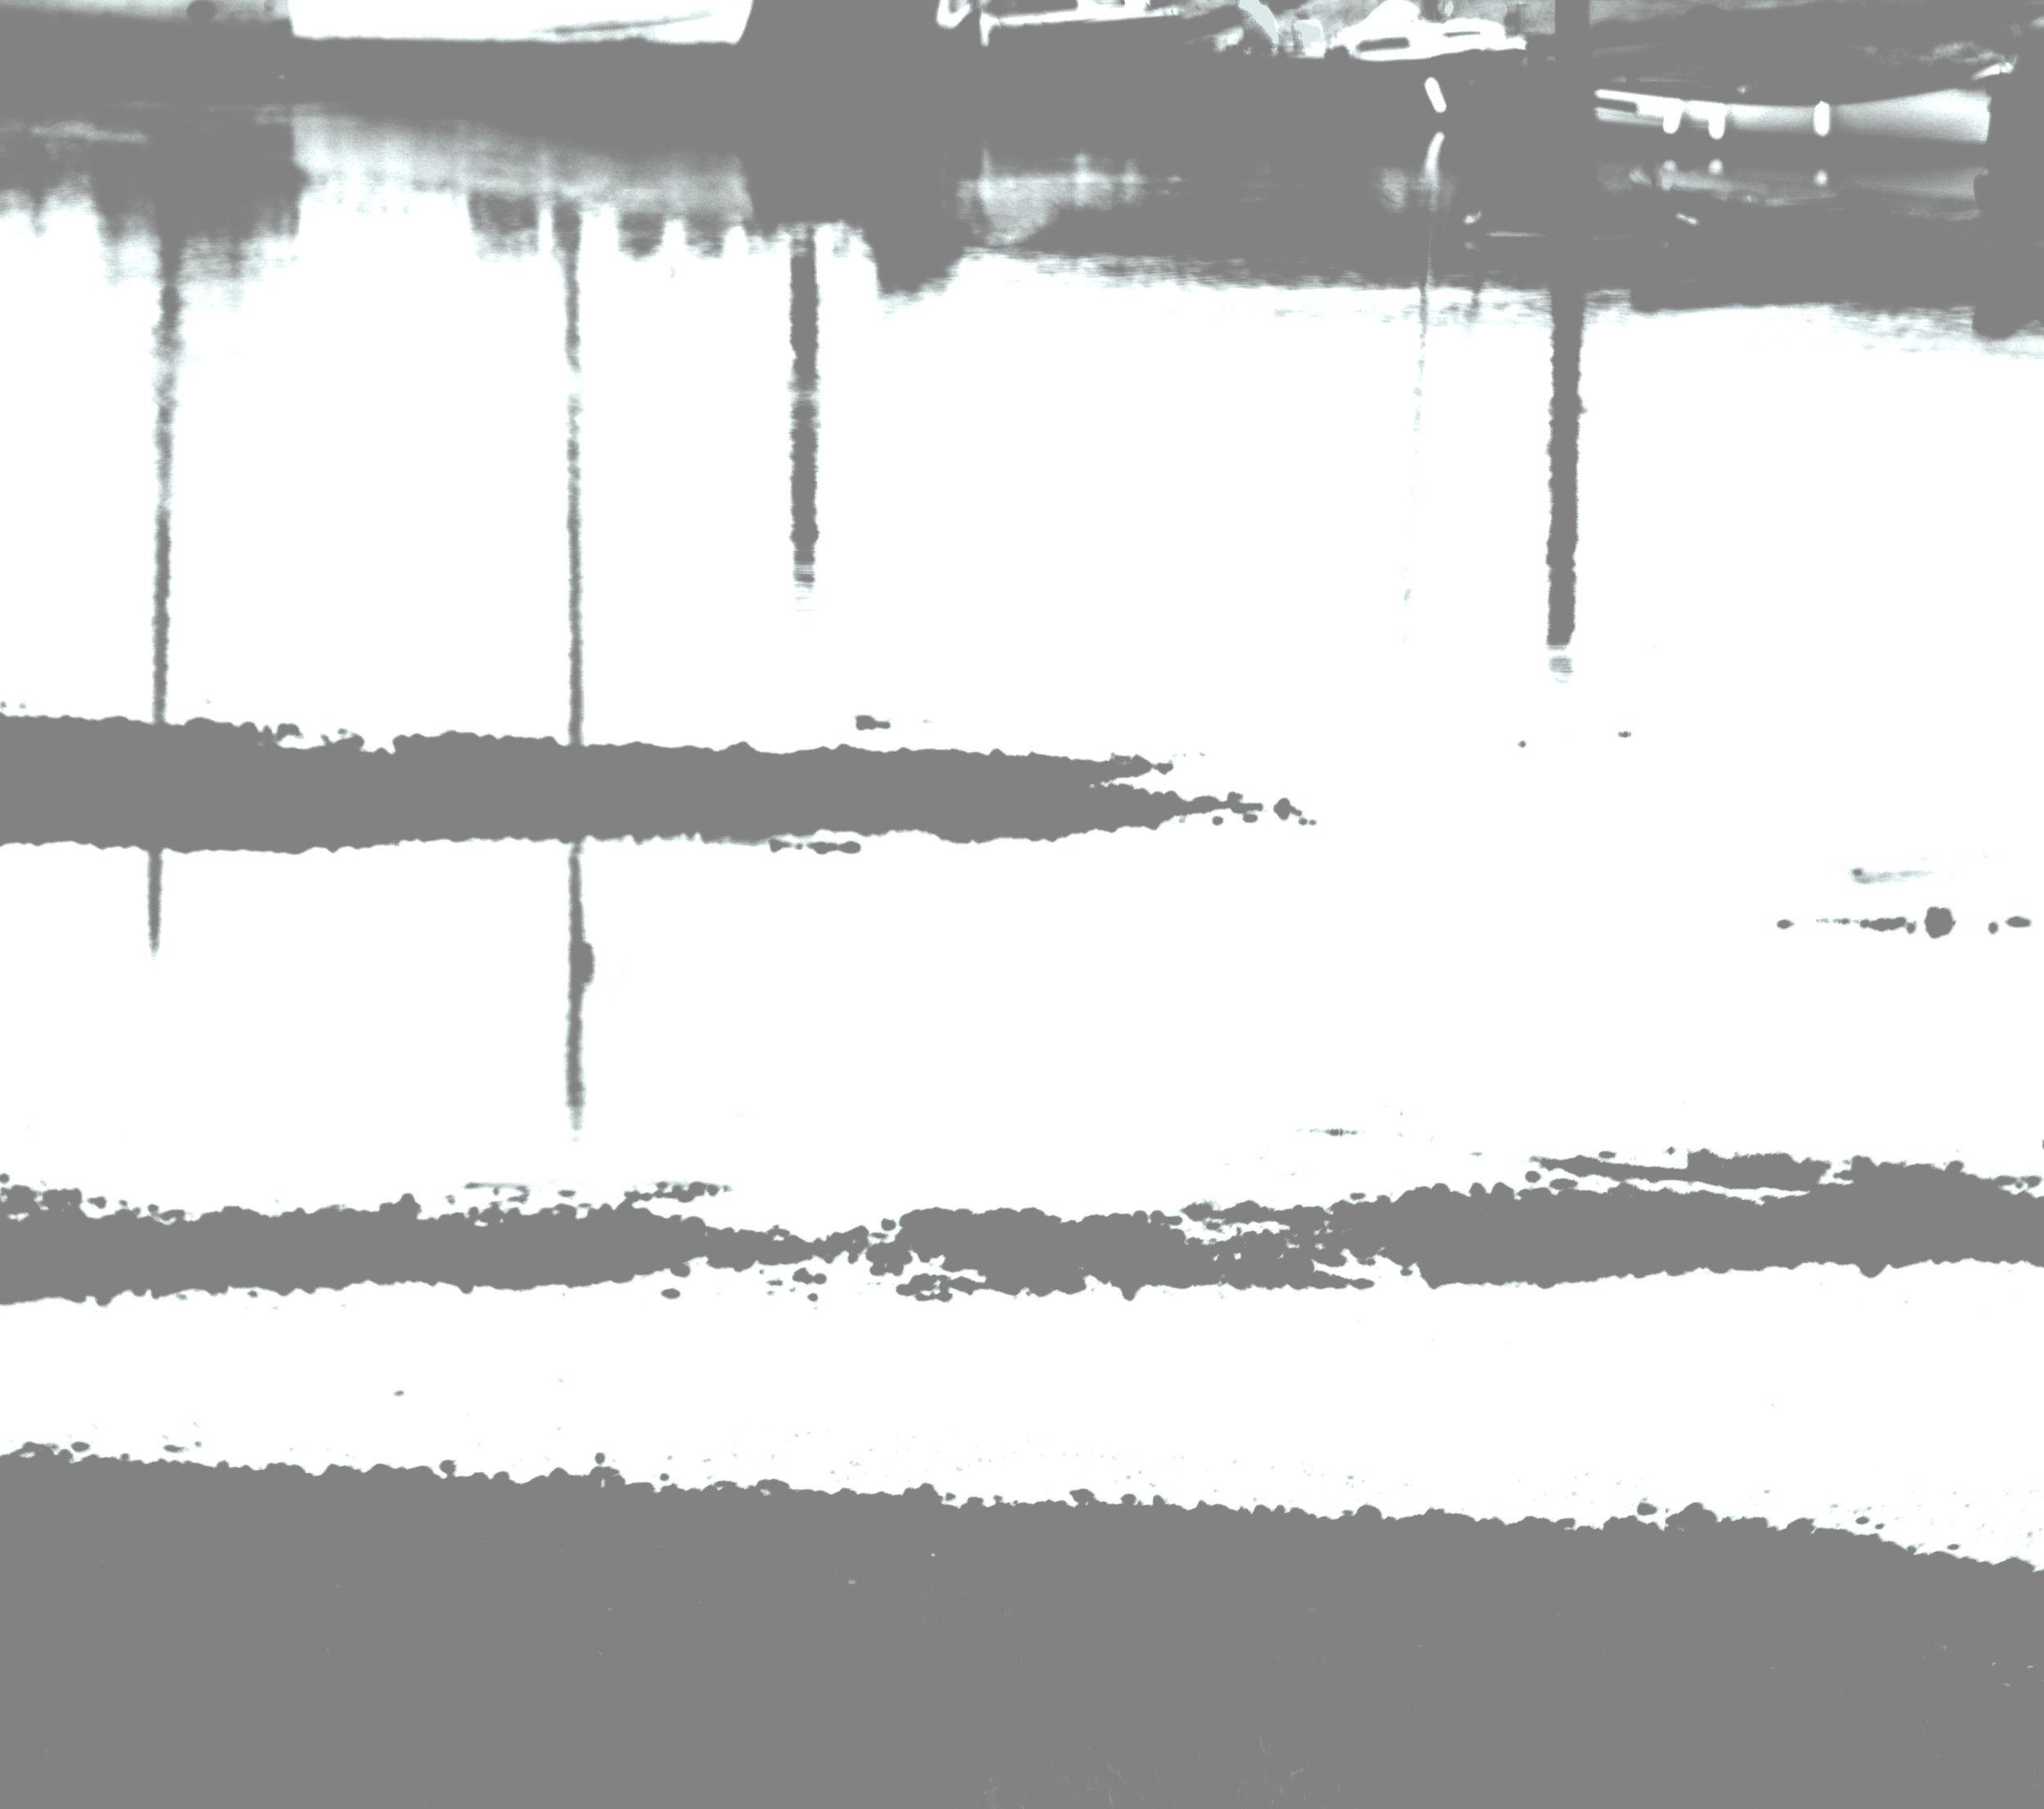 Digital image, near Burnham on Crouch, East Coast